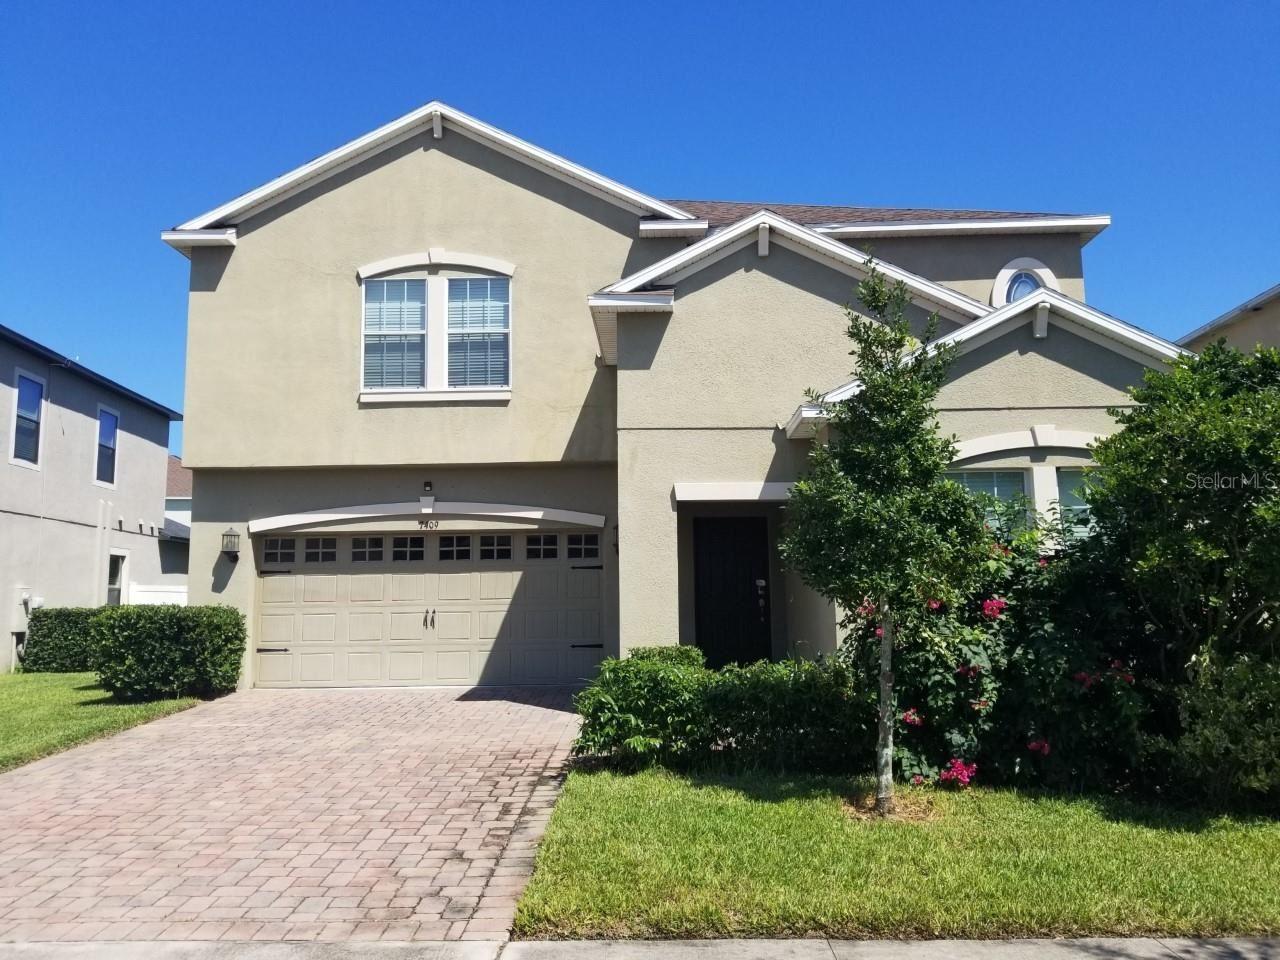 Photo of 7409 FAIRGROVE AVENUE, WINDERMERE, FL 34786 (MLS # O5975609)